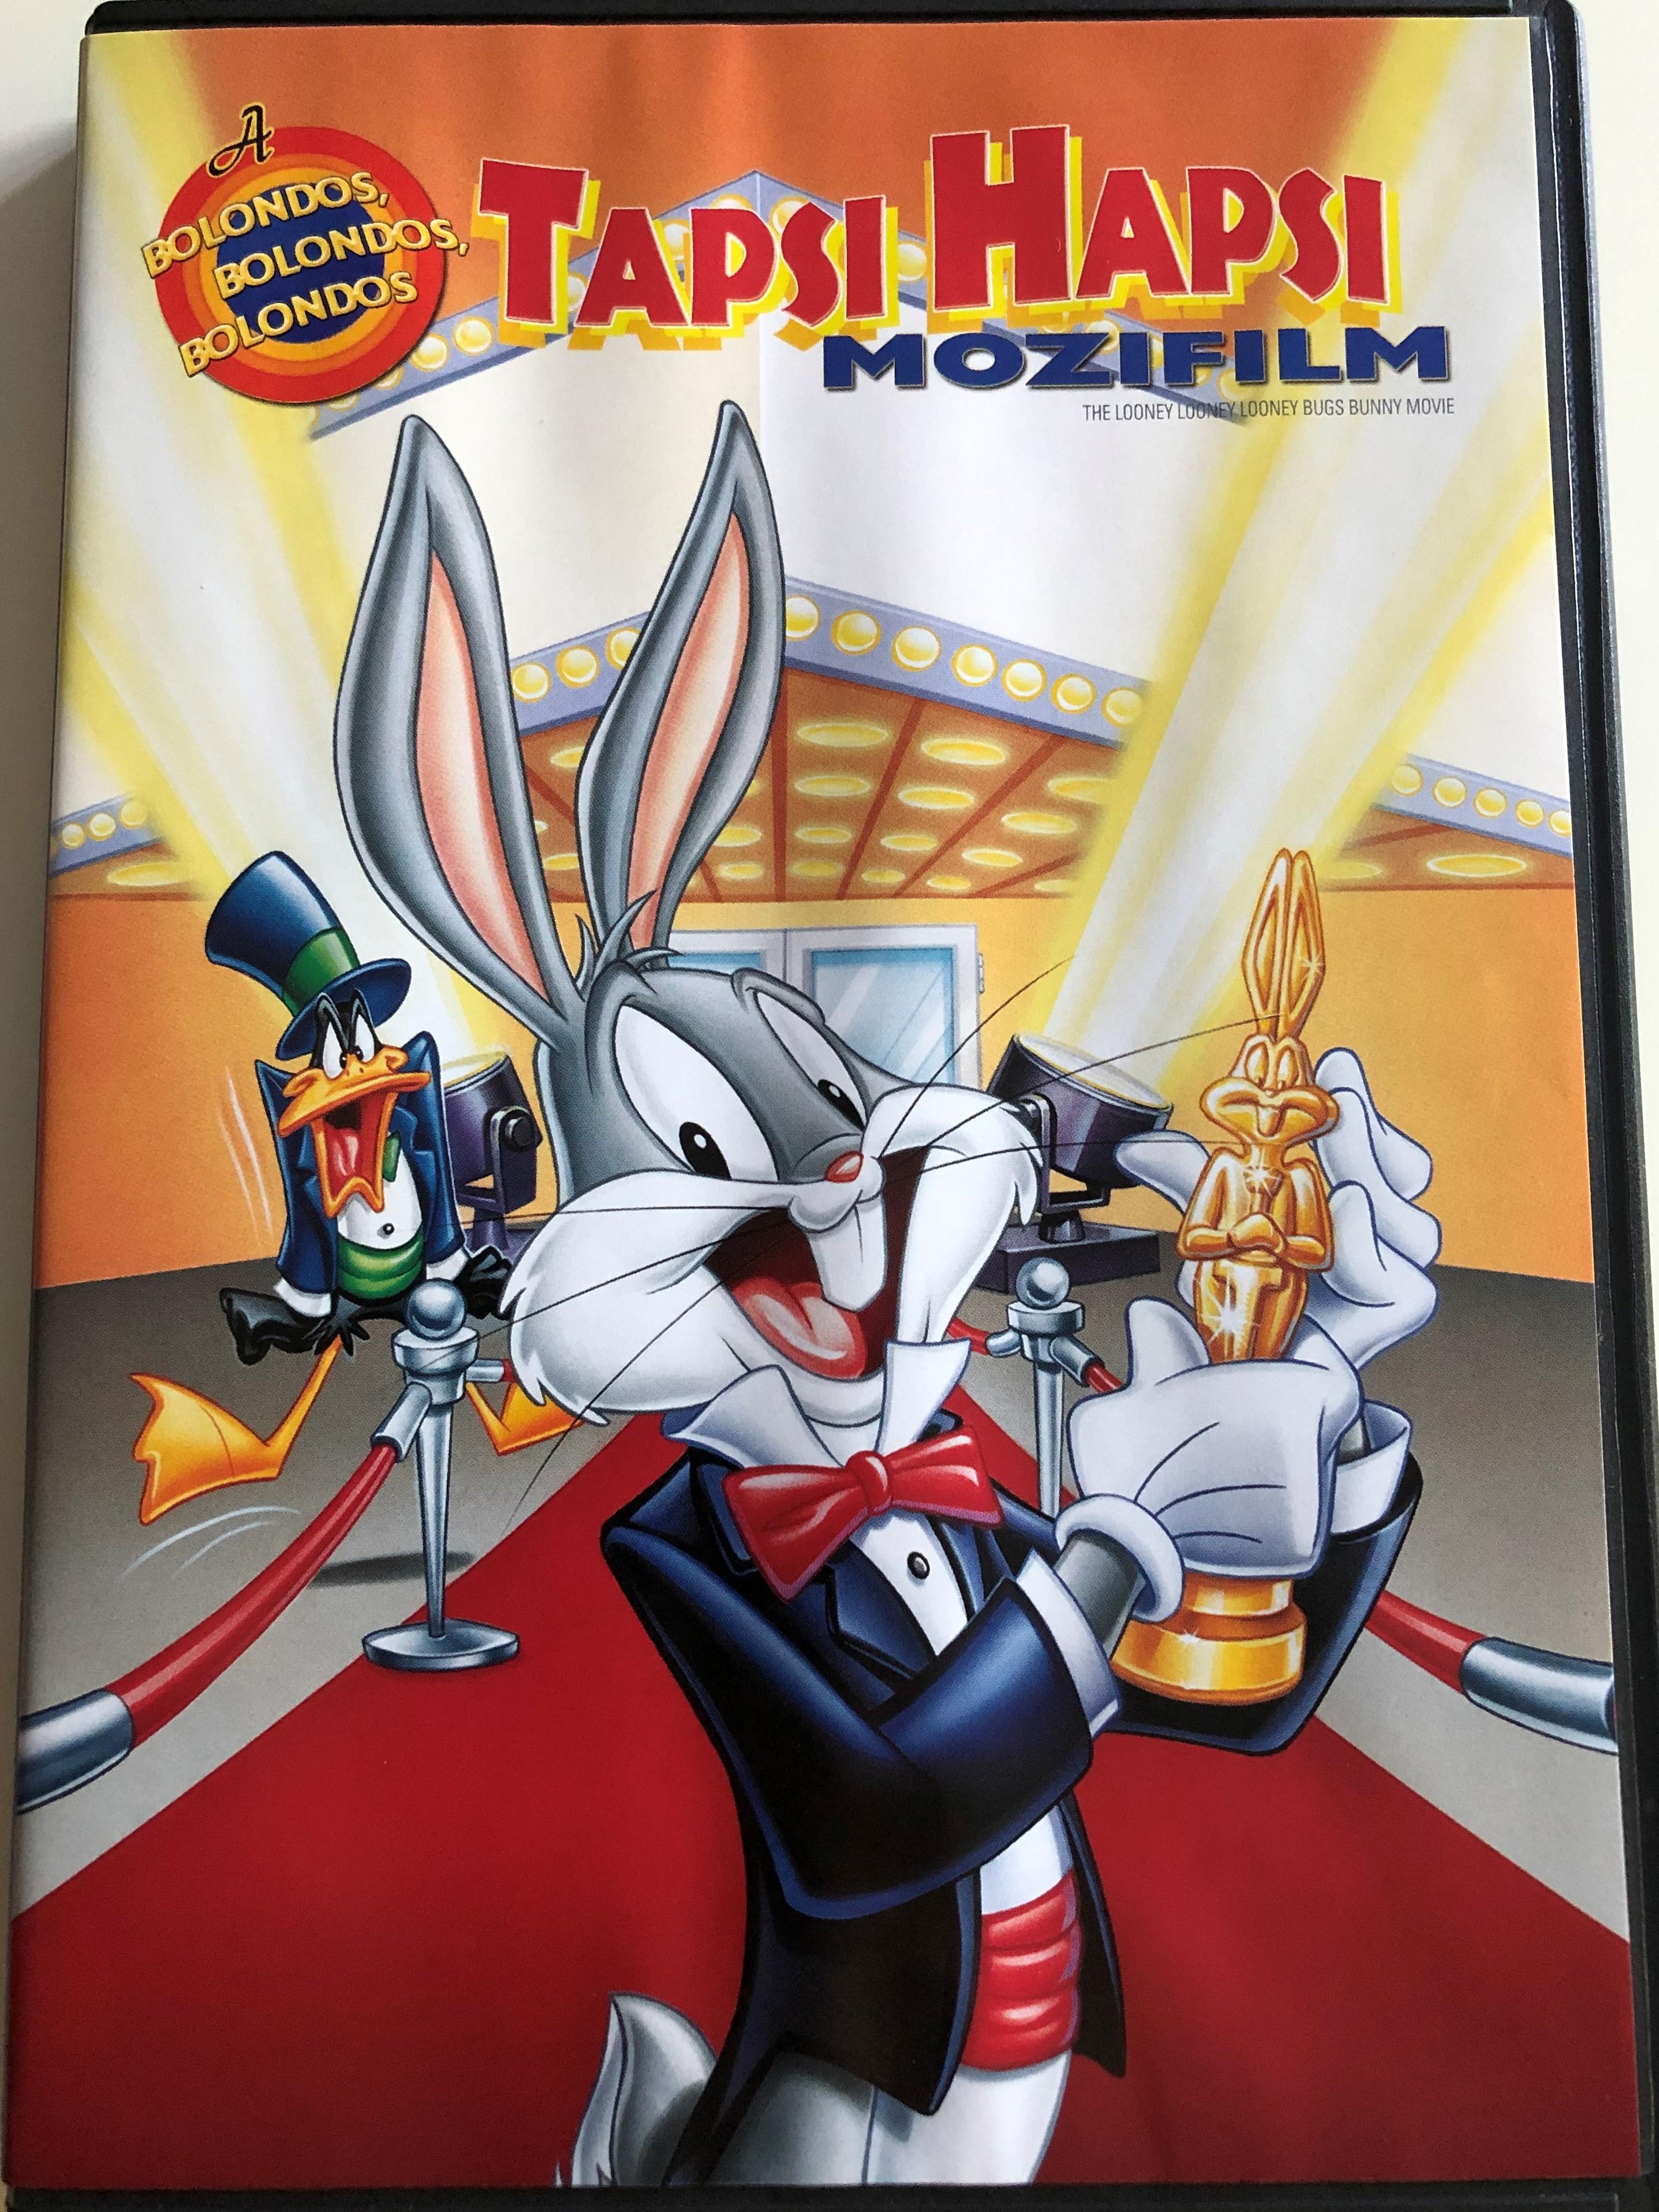 the-looney-looney-looney-bugs-bunny-movie-dvd-1981-a-bolondos-bolondos-bolondos-tapsi-hapsi-mozifilm-directed-by-friz-freleng-starring-mel-blanc-june-foray-1-.jpg